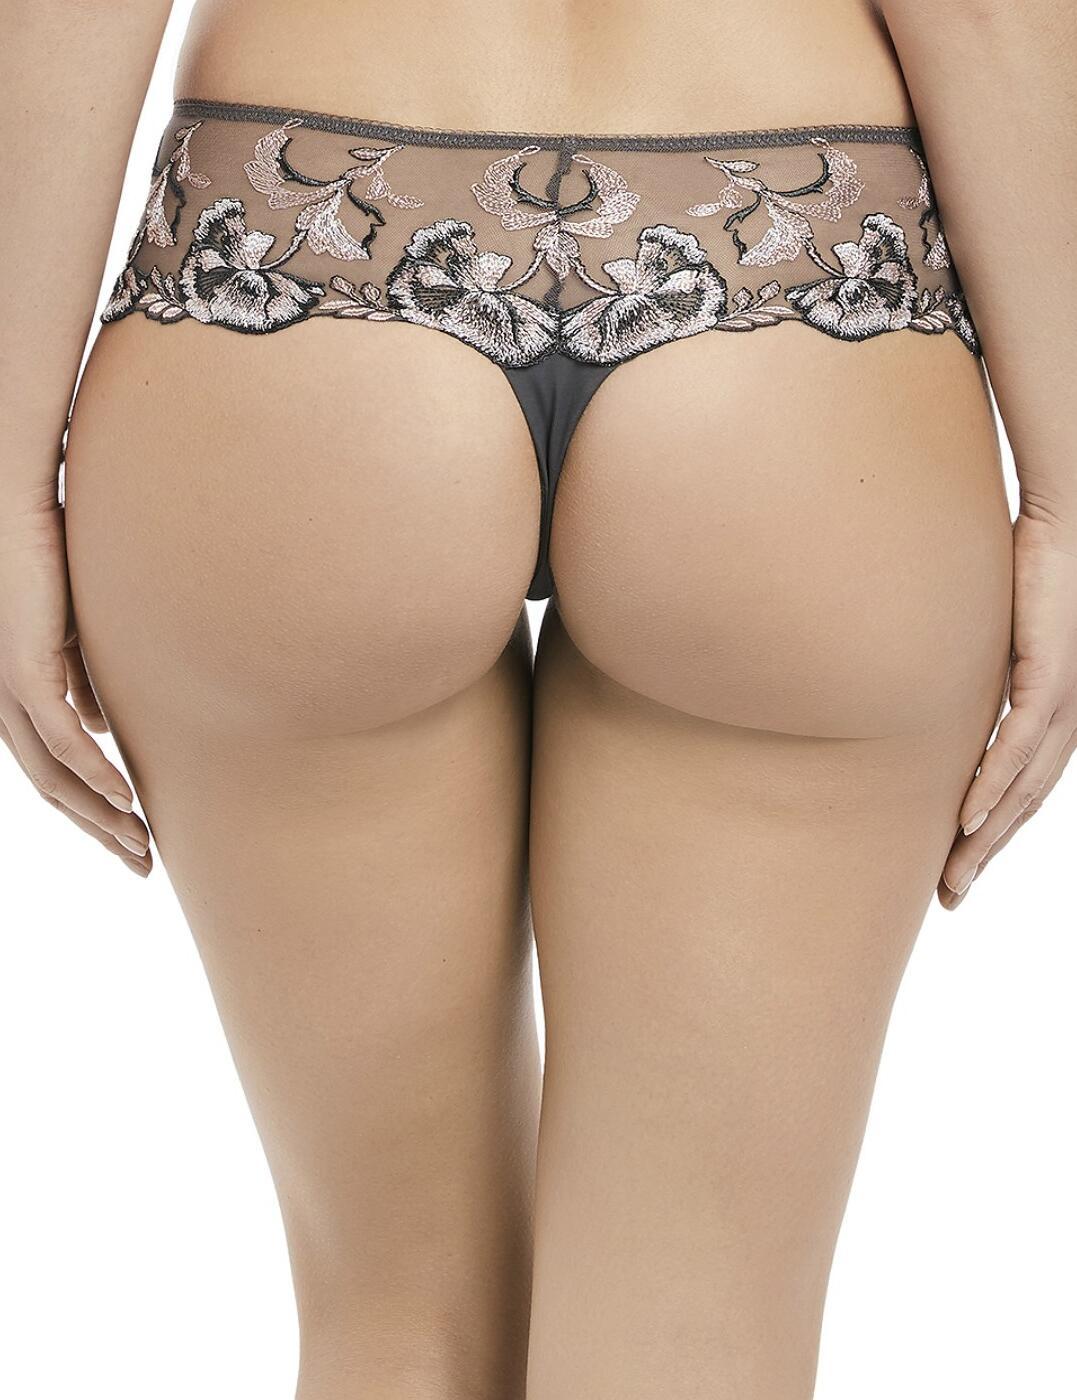 Fantasie-Angelina-Deep-Thong-9557-New-Womens-Luxury-Lingerie thumbnail 6